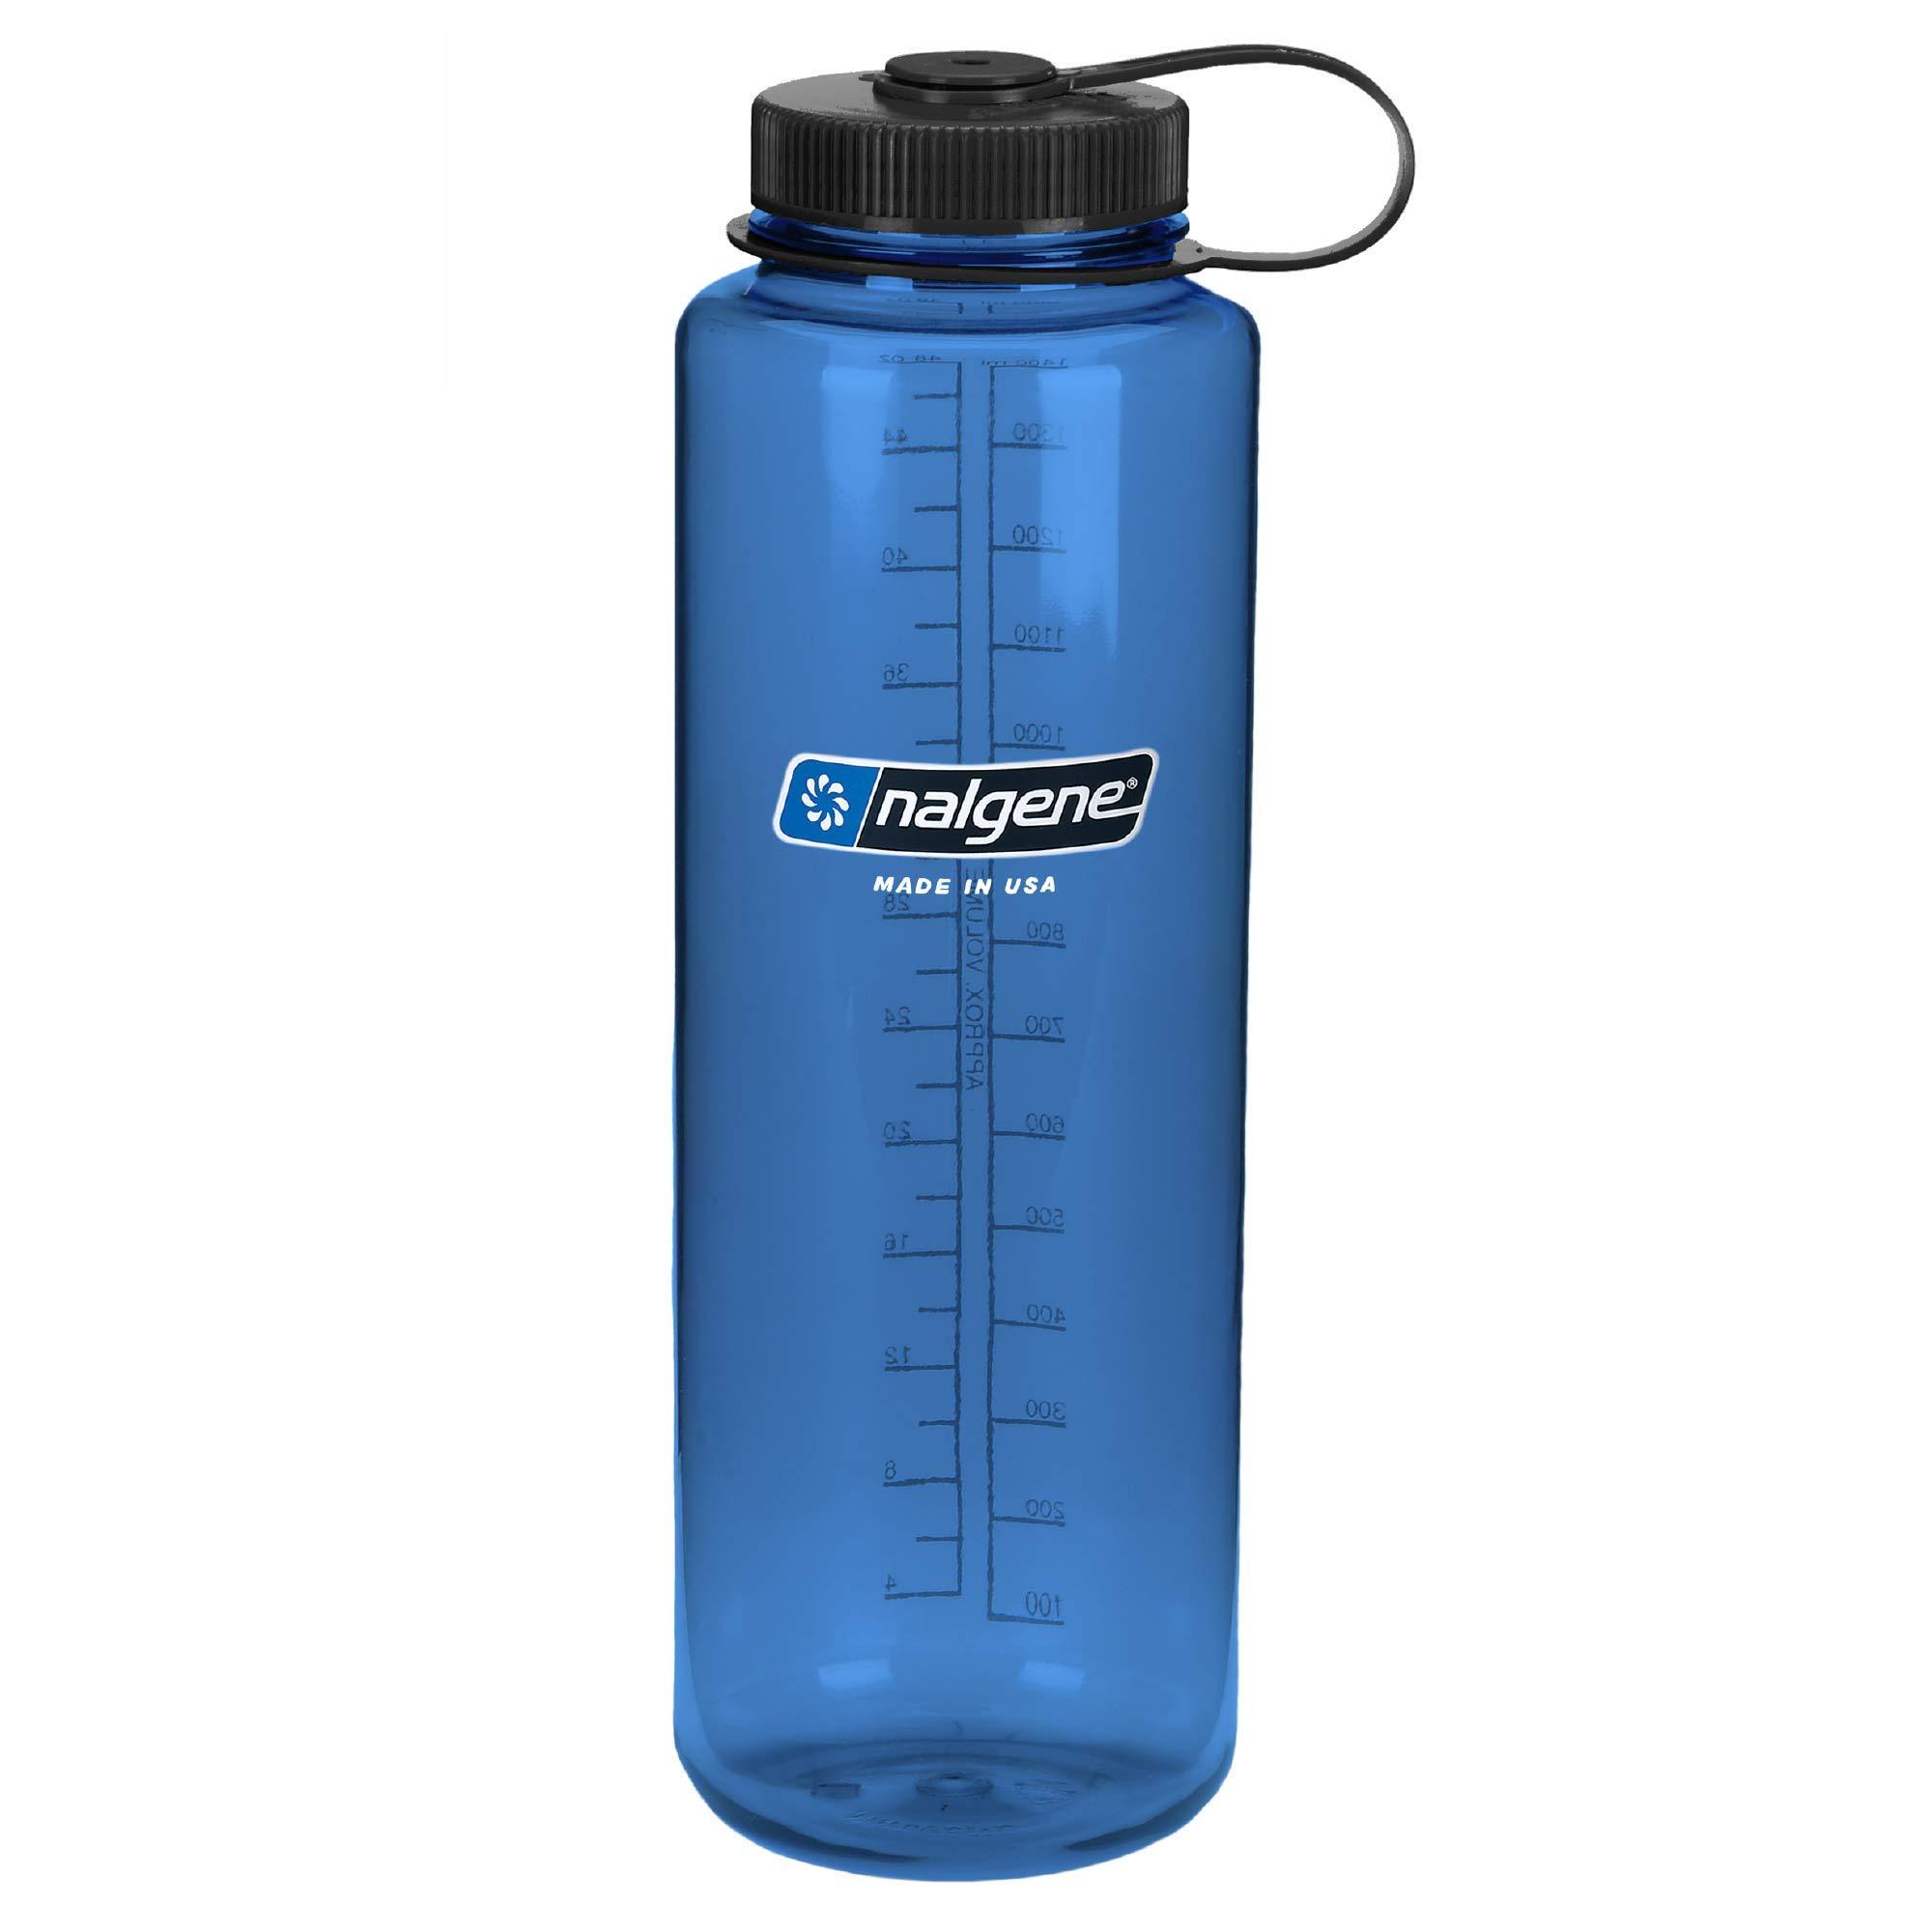 Nalgene Tritan Wide Mouth BPA-Free Water Bottle (48oz)